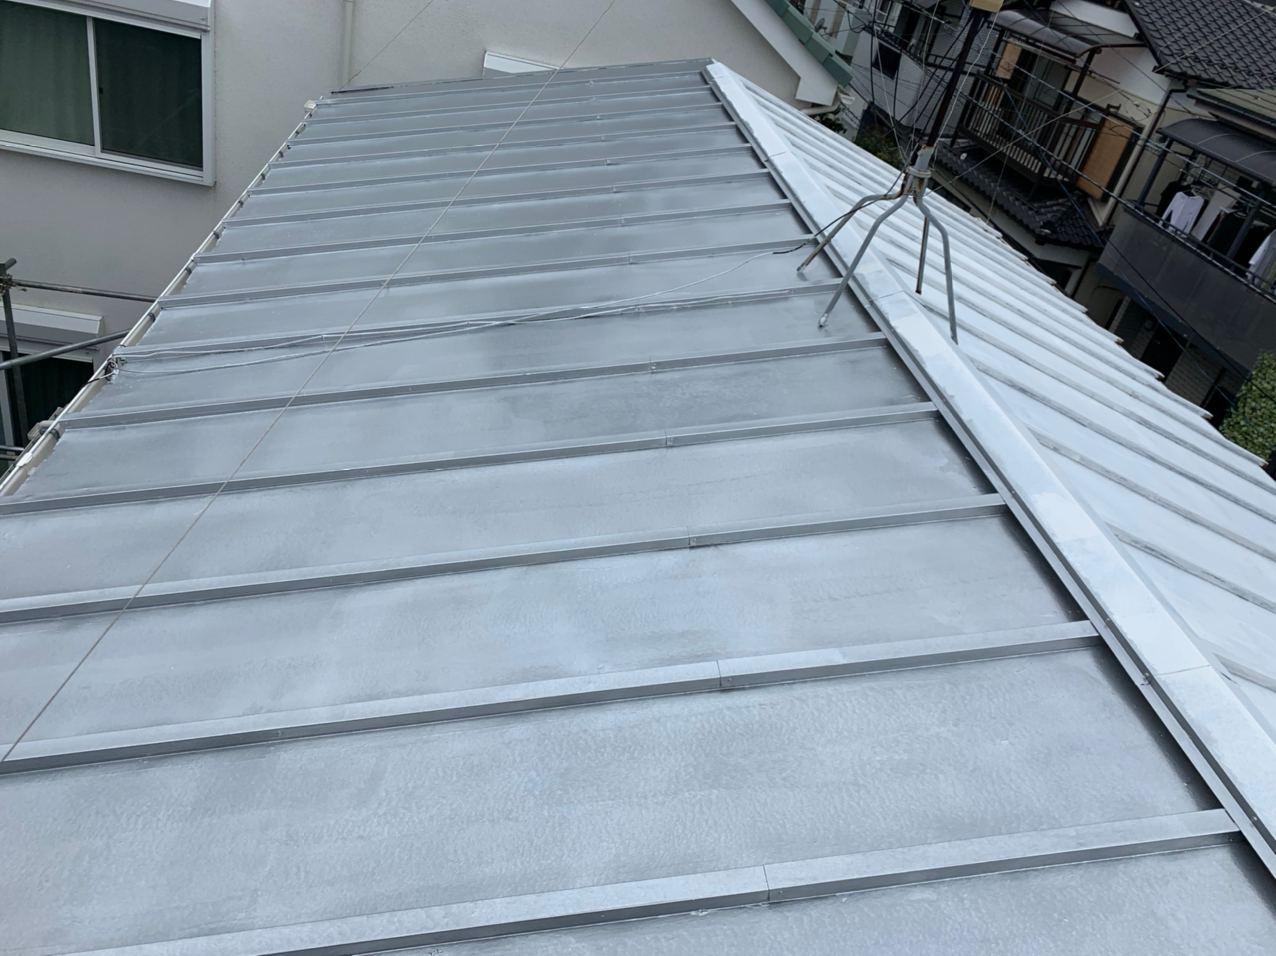 神奈川県厚木市にて棟板金交換・屋根塗装工事